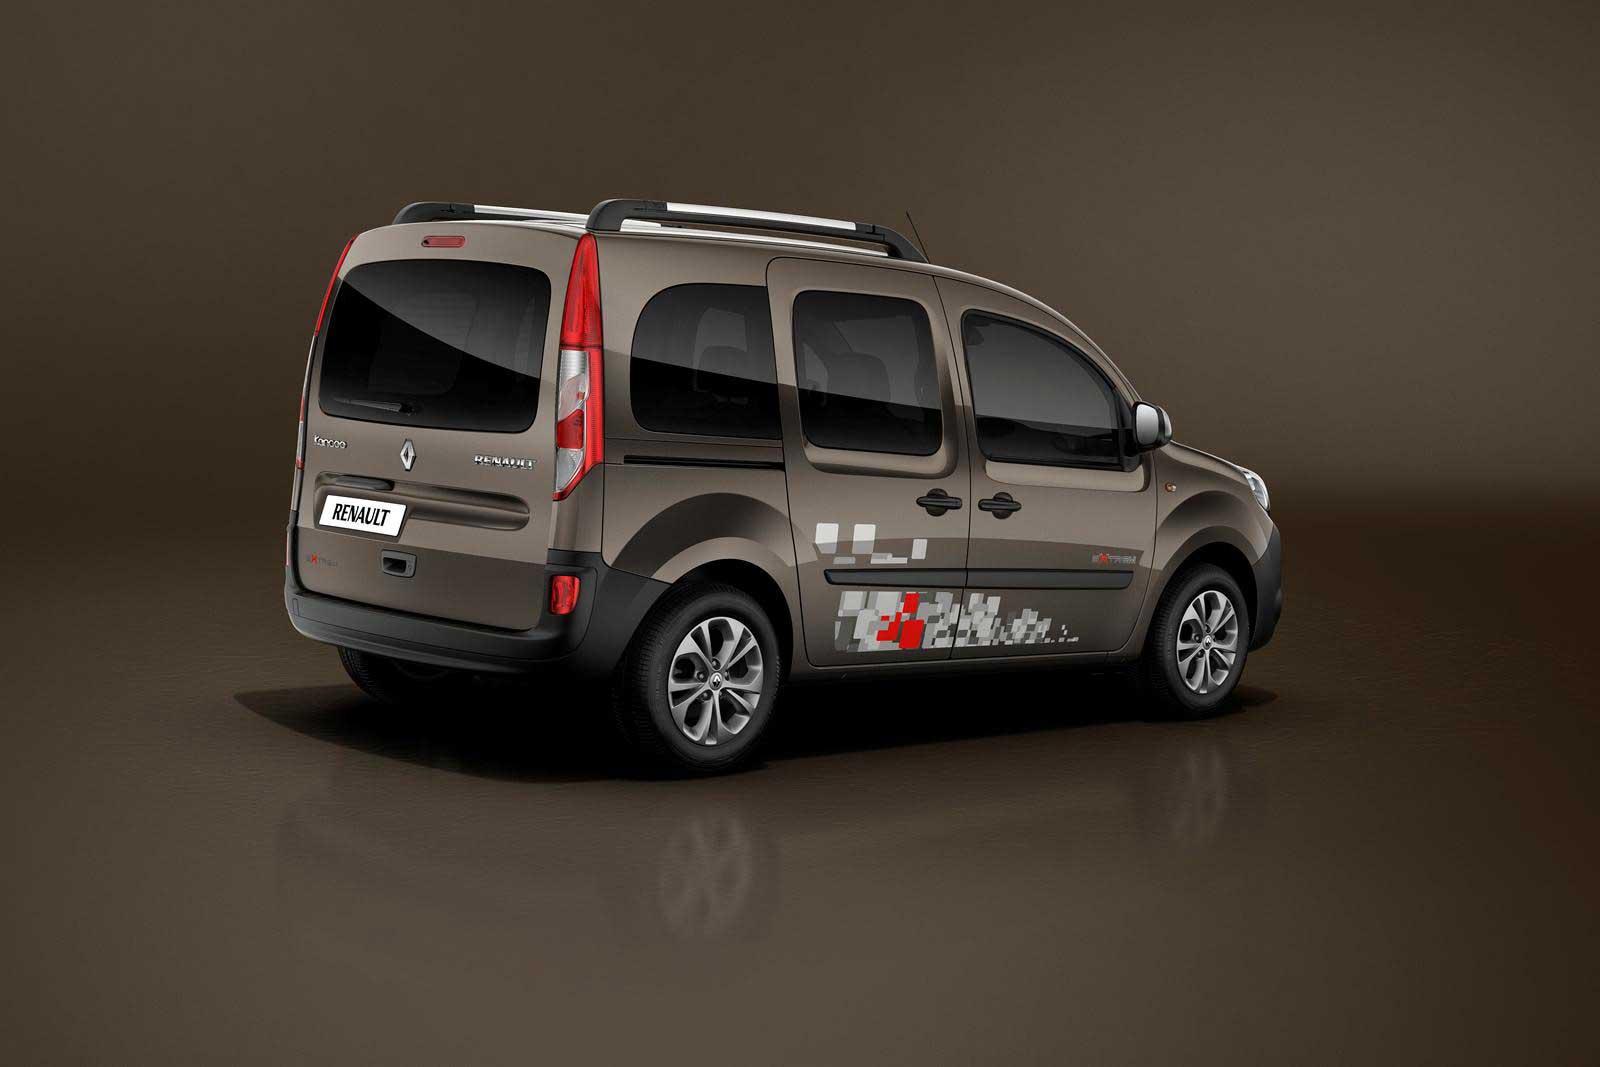 Renault Кангу 2014 фото